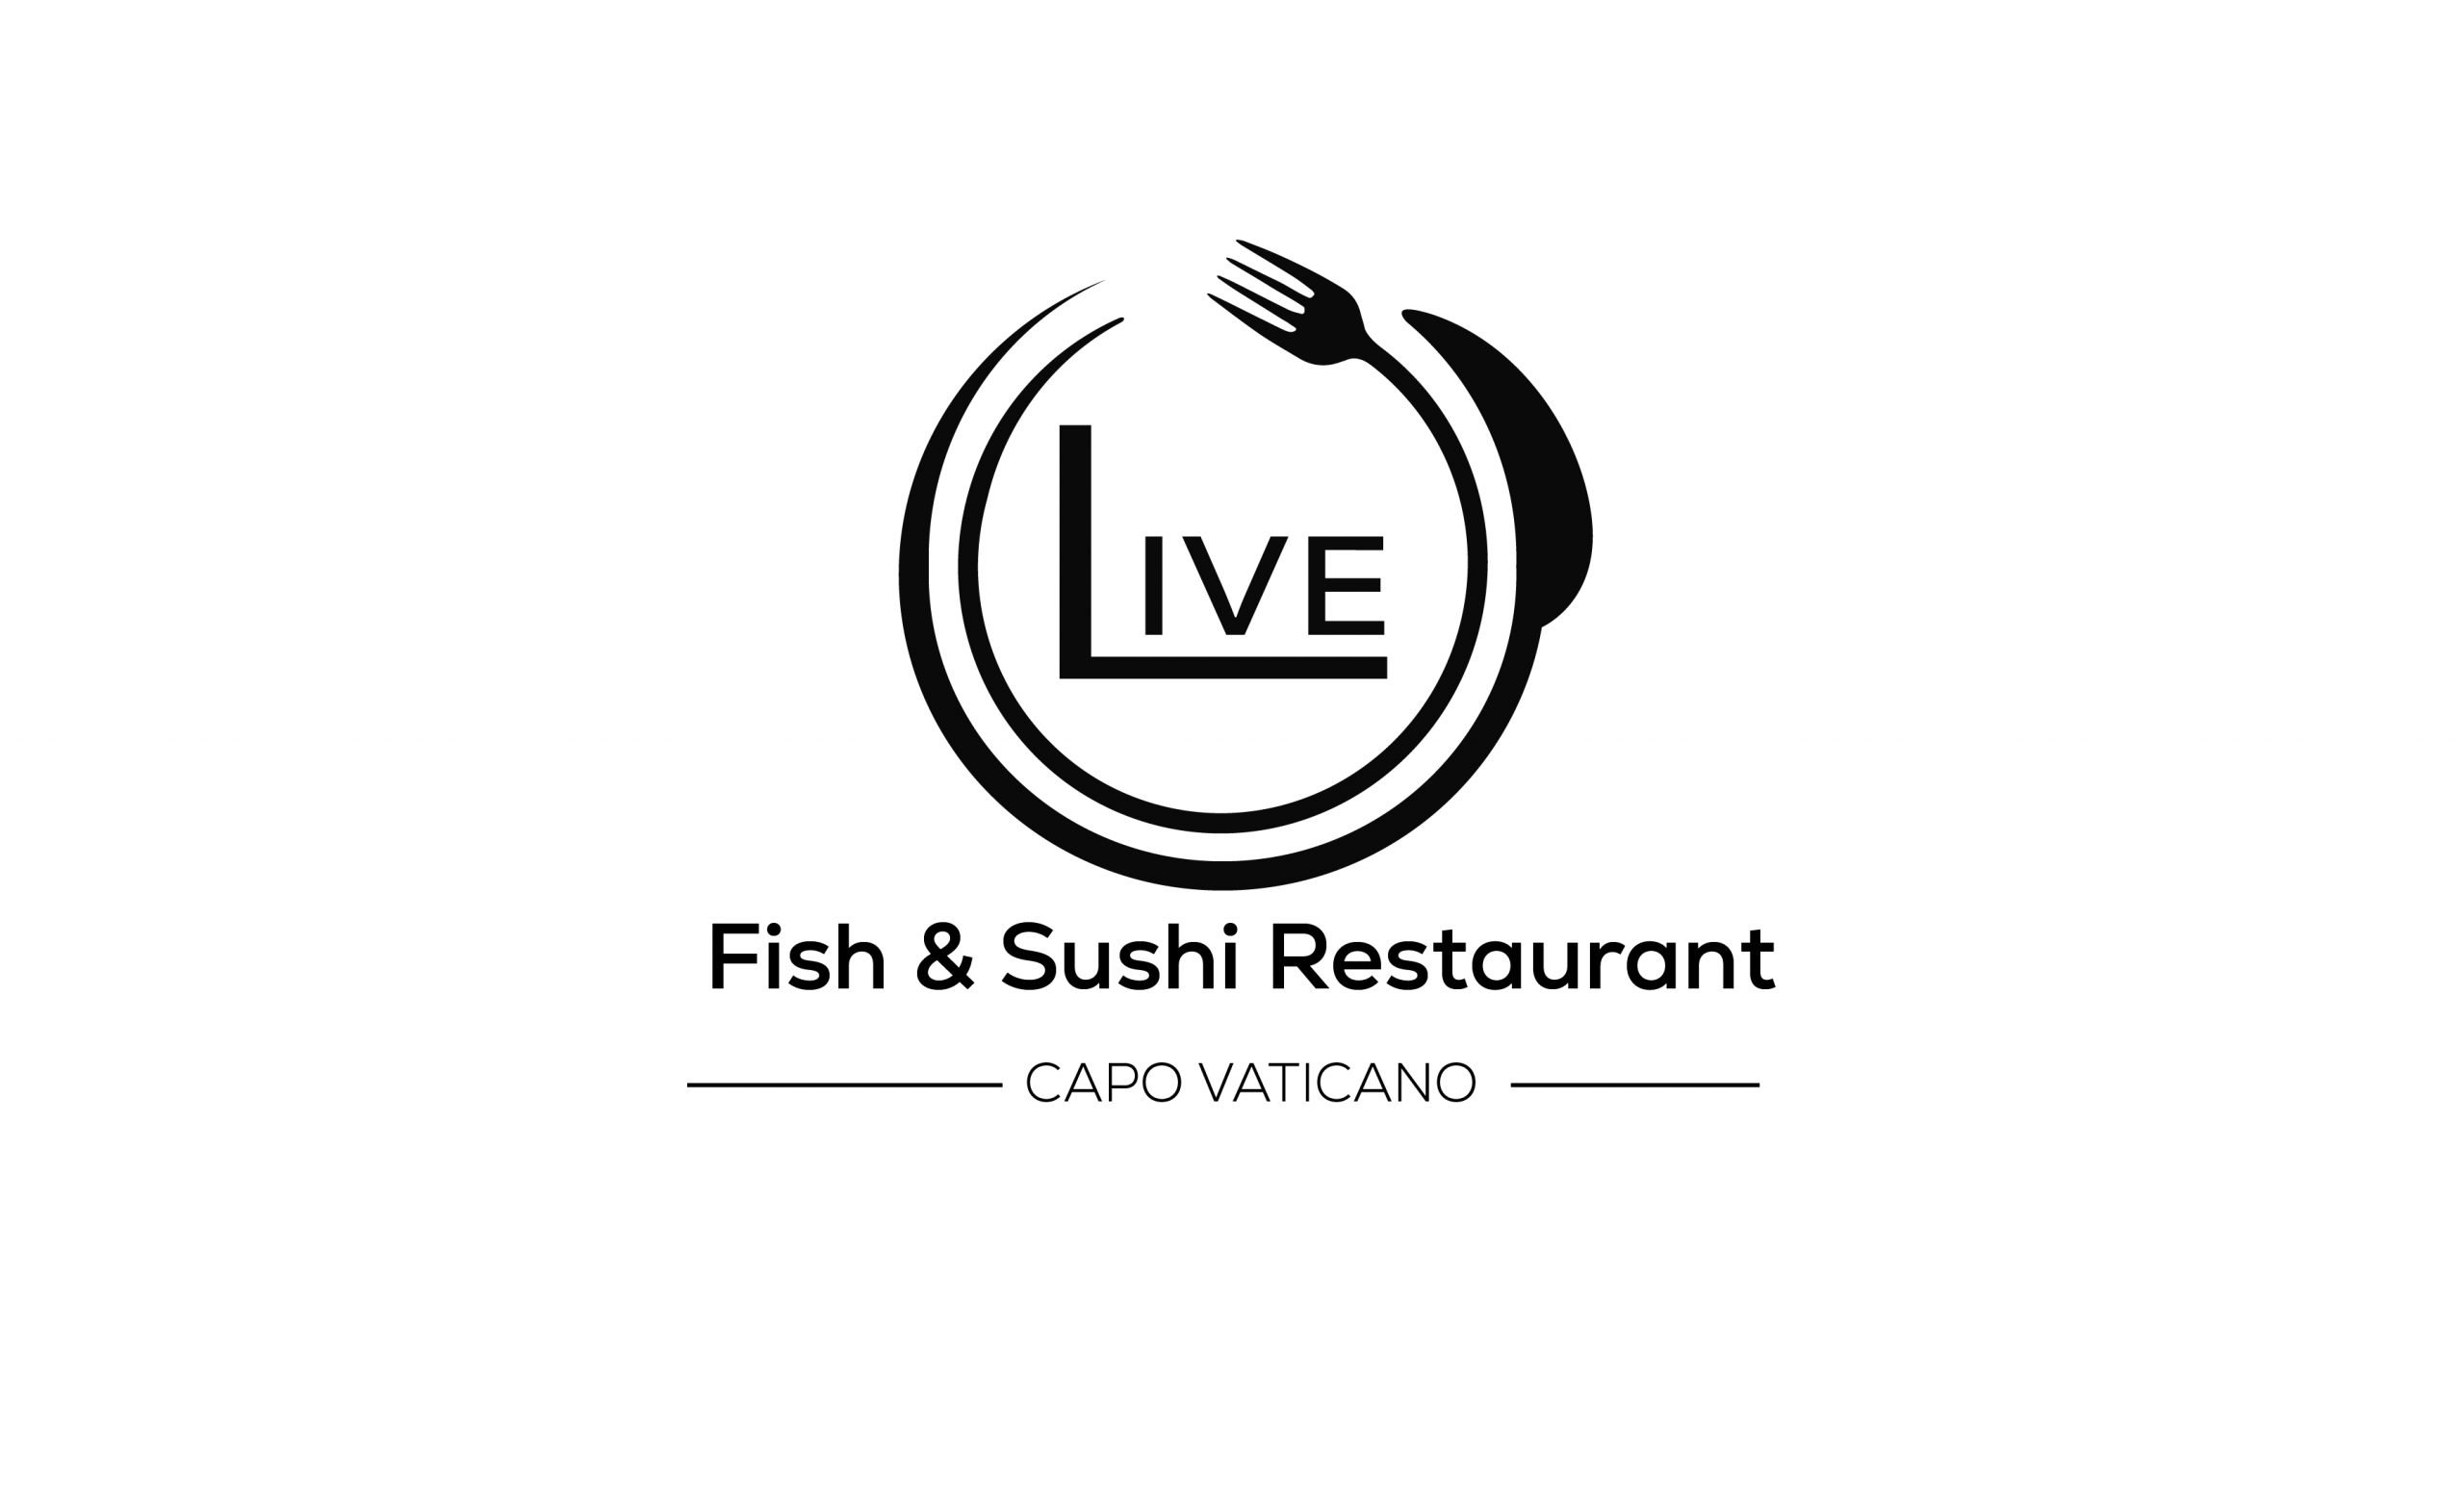 Live Fish & Sushi Restaurant